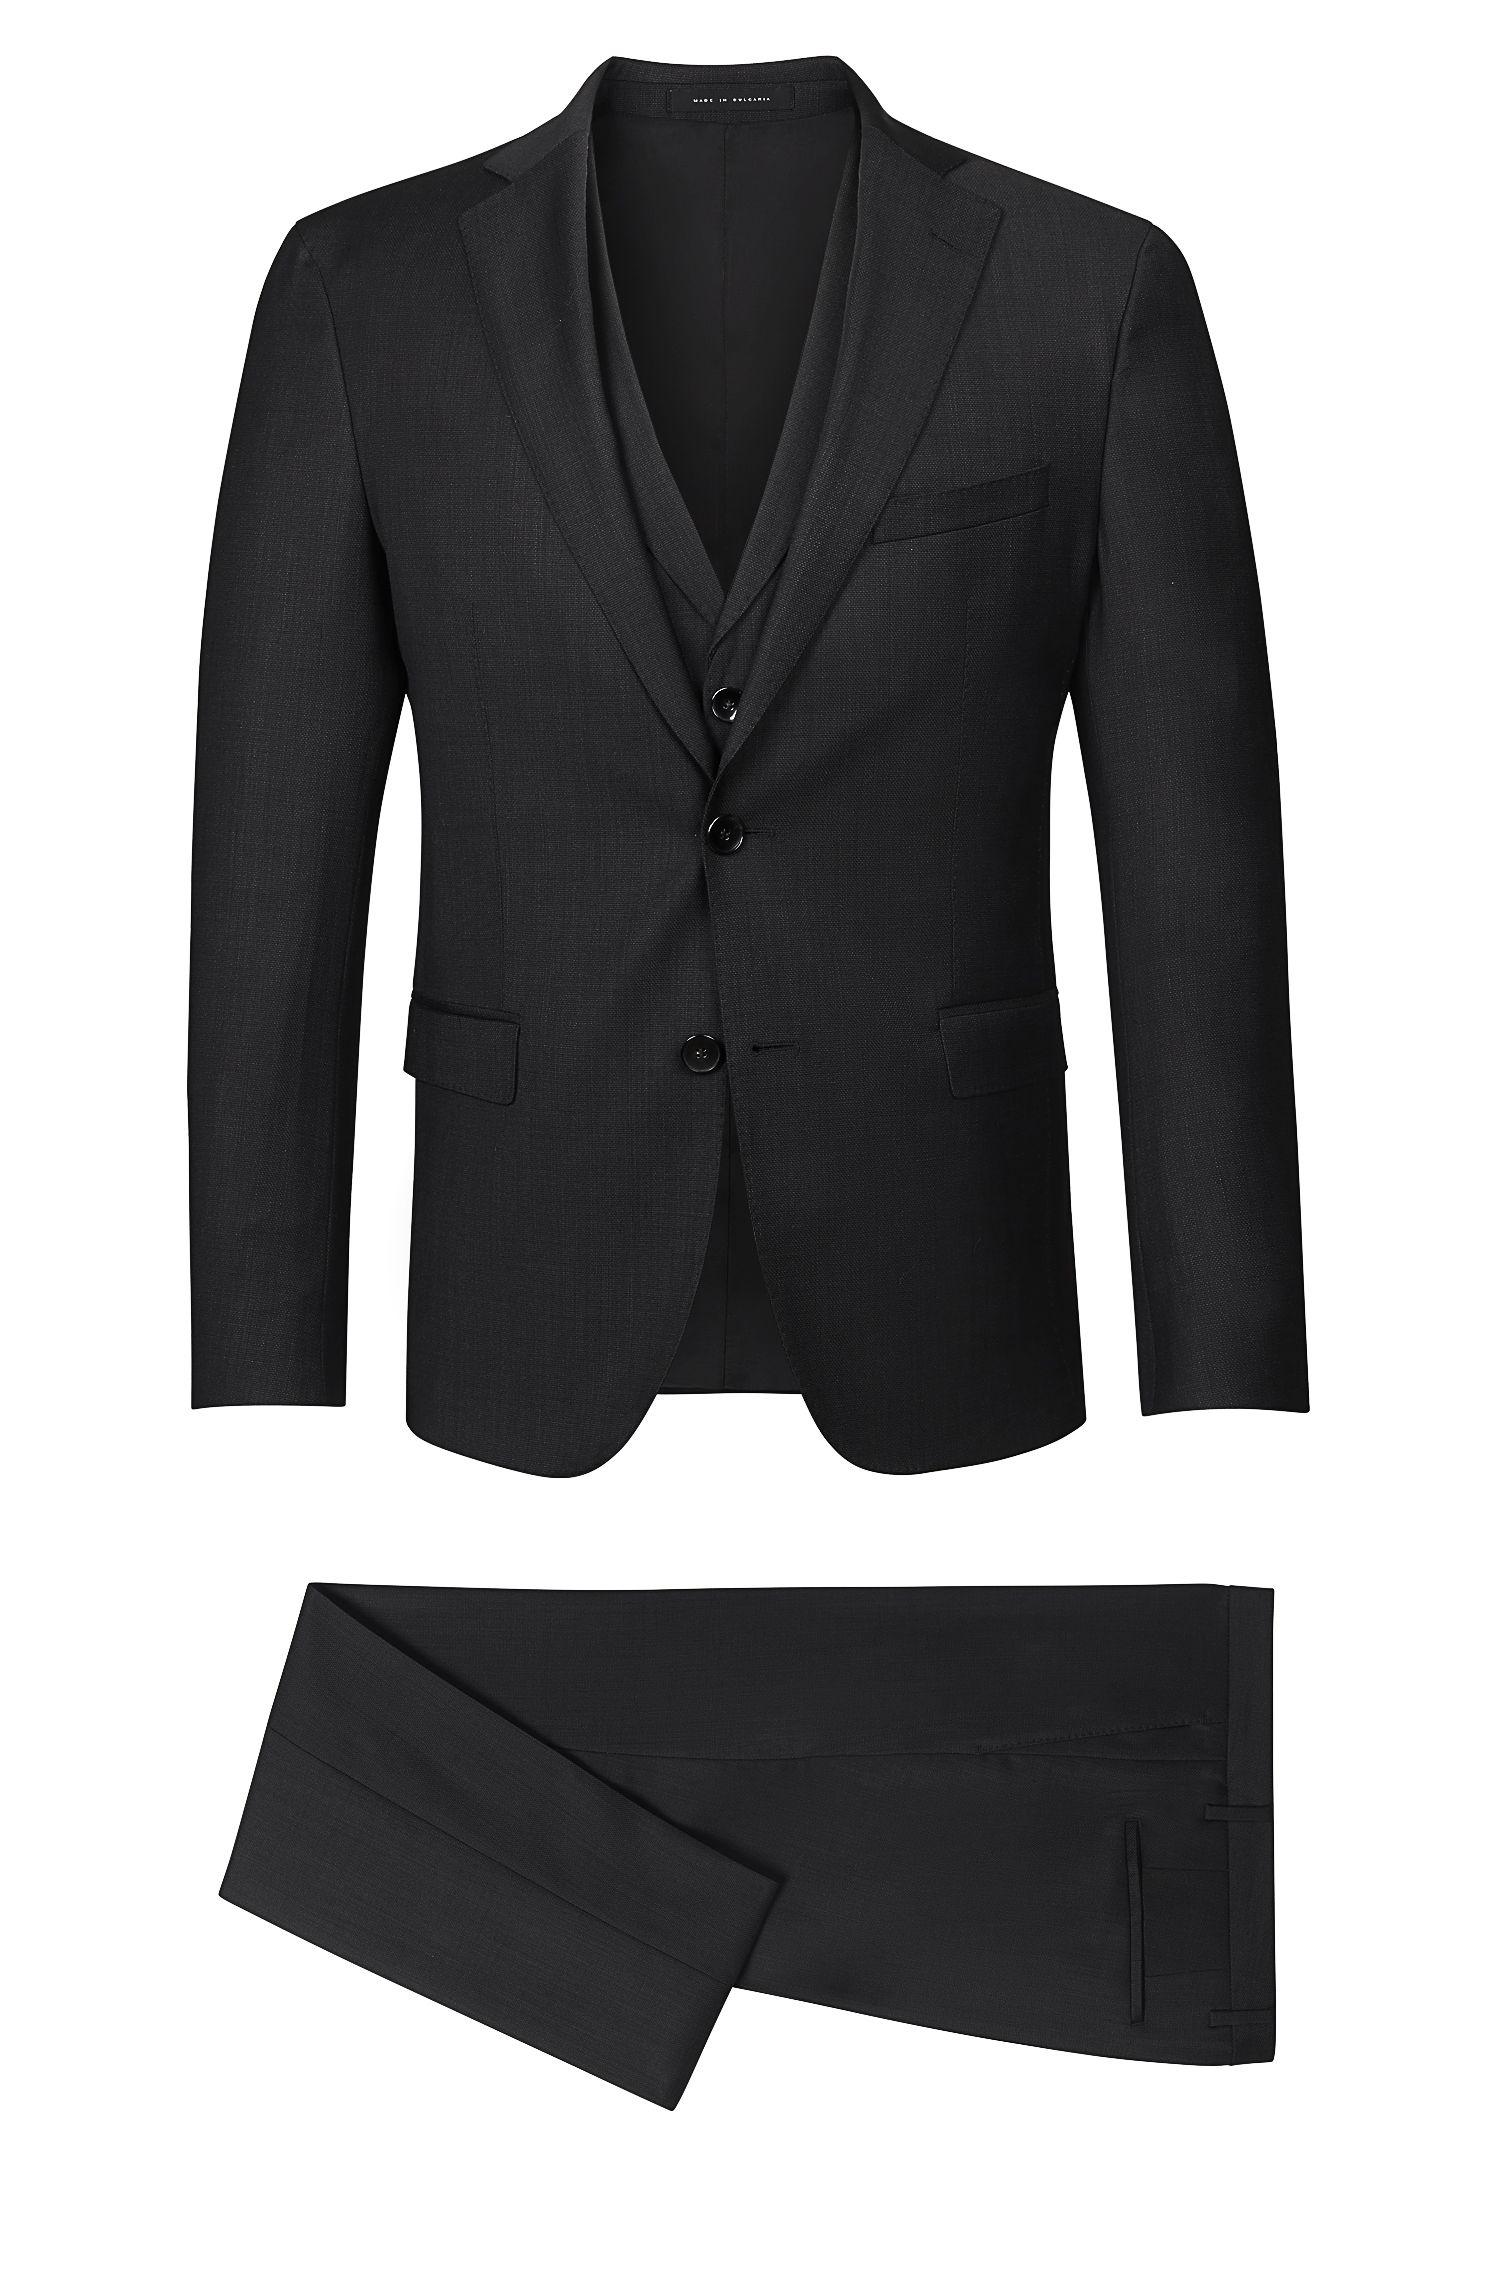 Stretch Virgin Wool Blend 3-Piece Suit, Extra-Slim Fit | Reyno/Wave WE